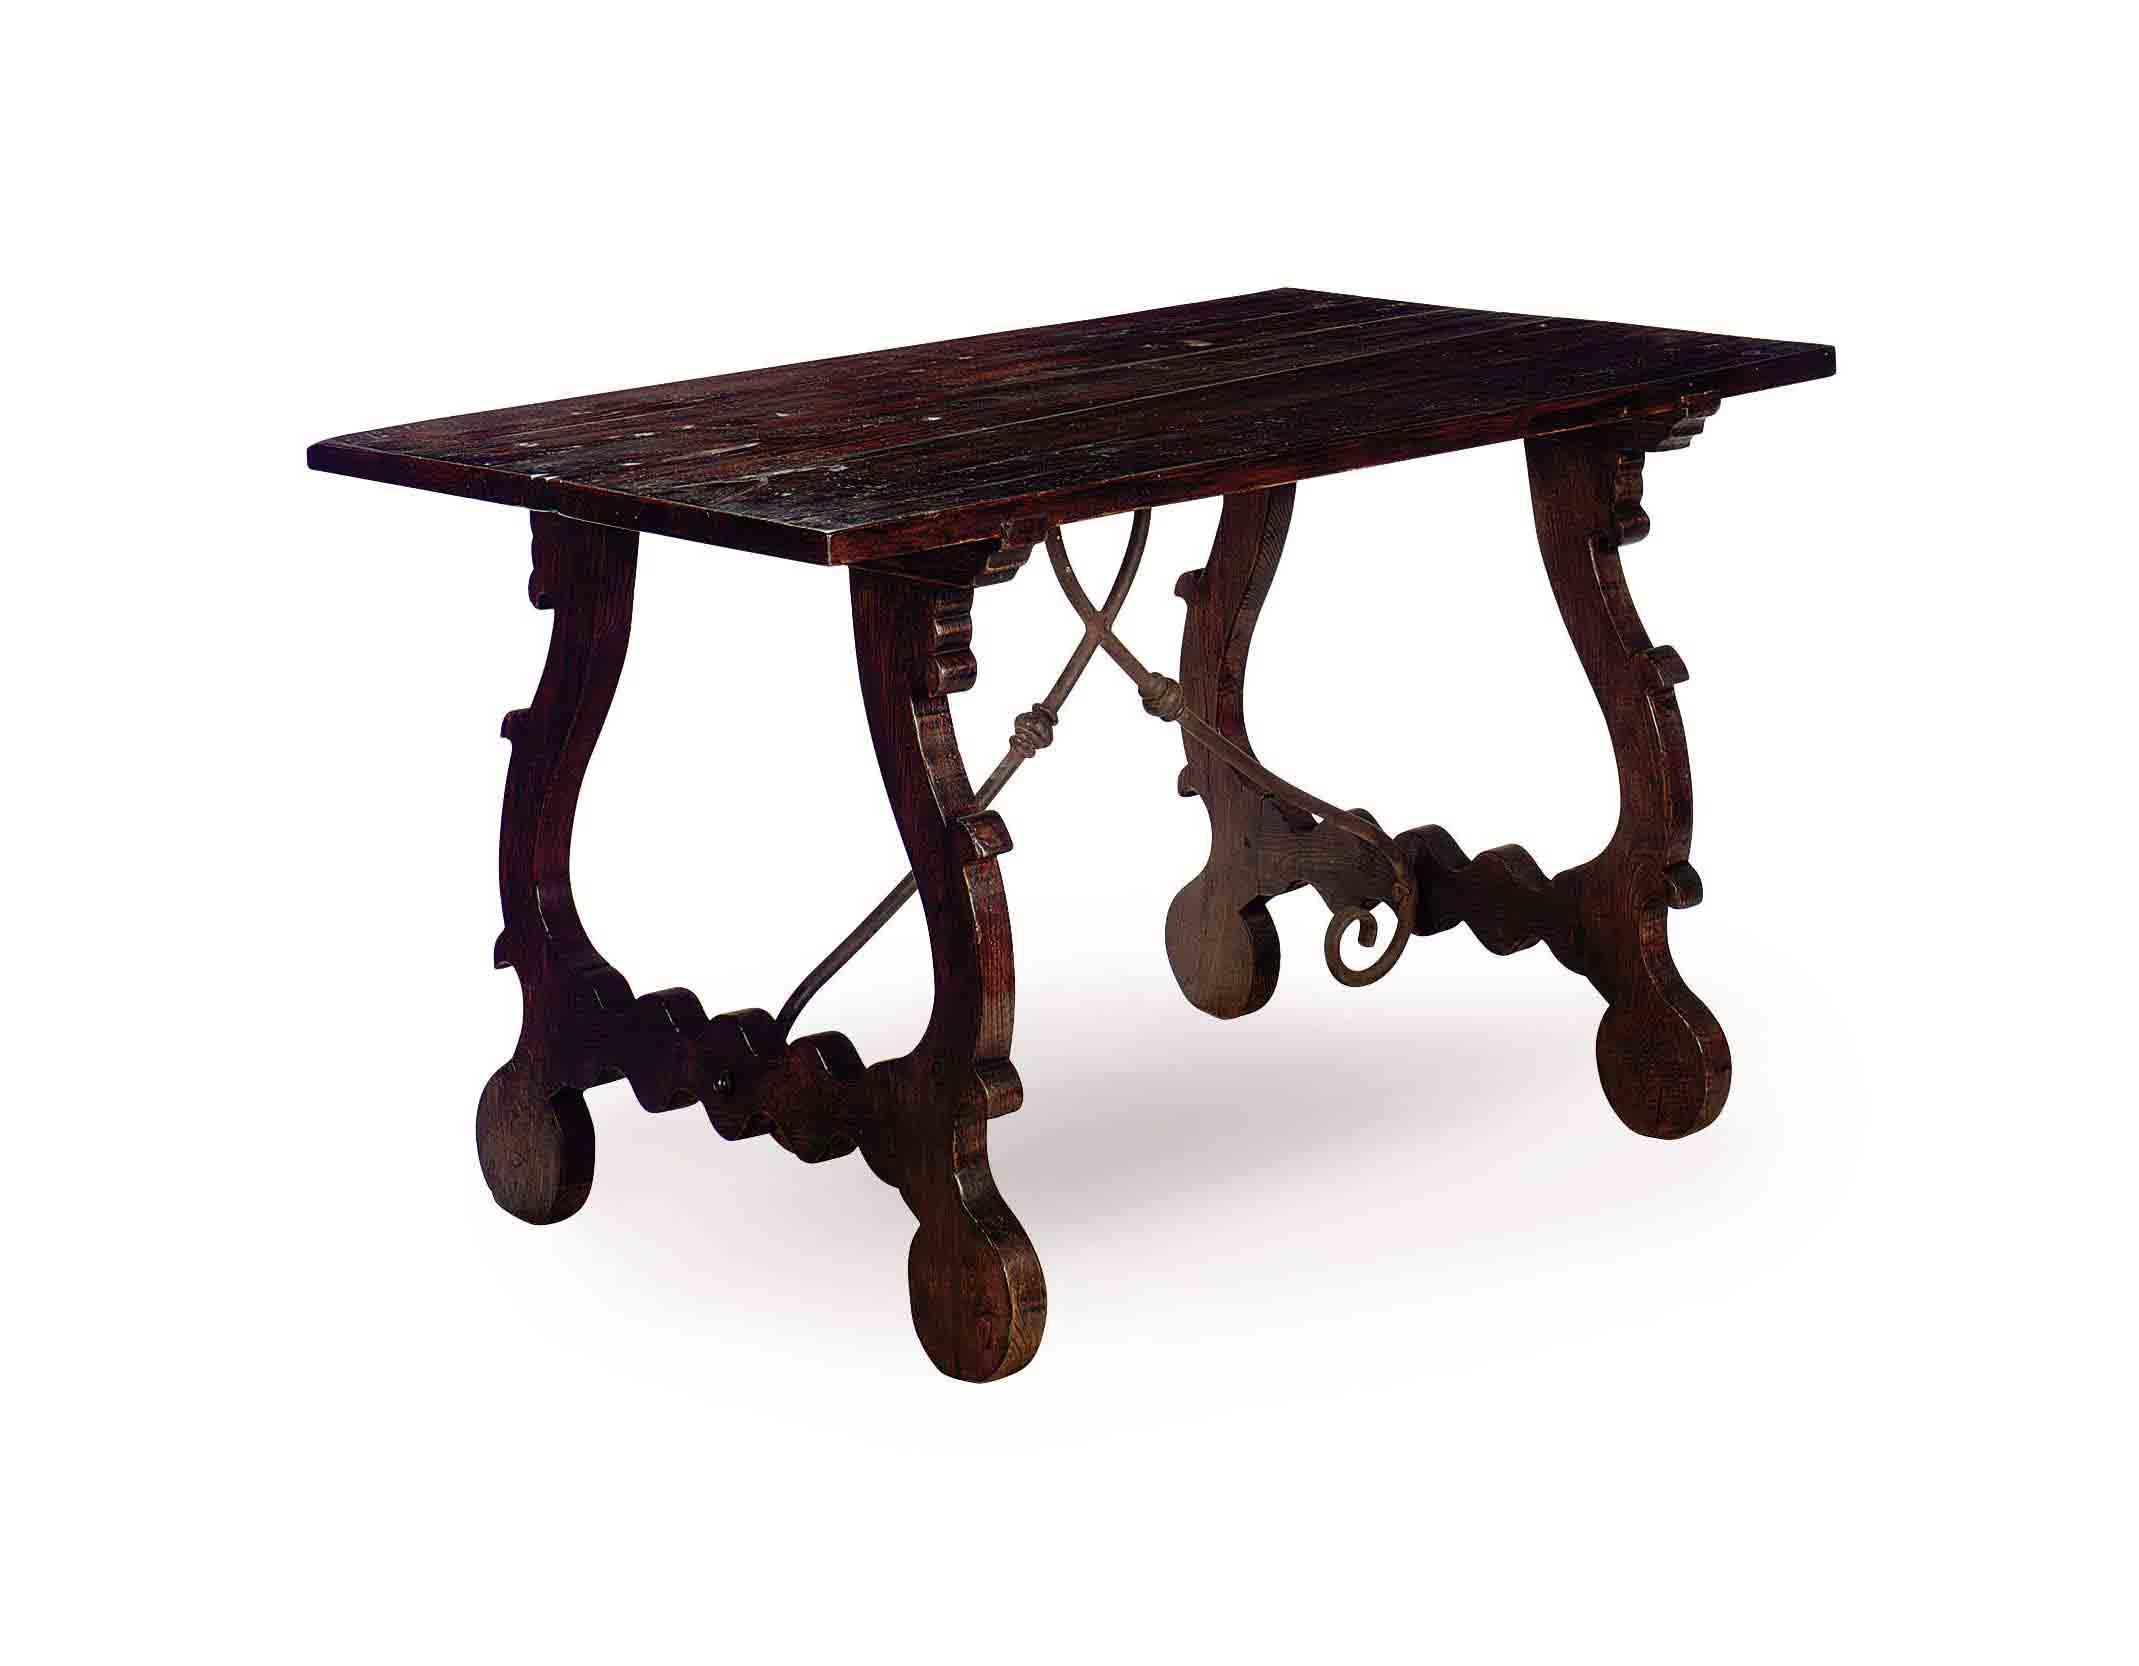 A CONTINENTAL OAK TRESTLE TABL